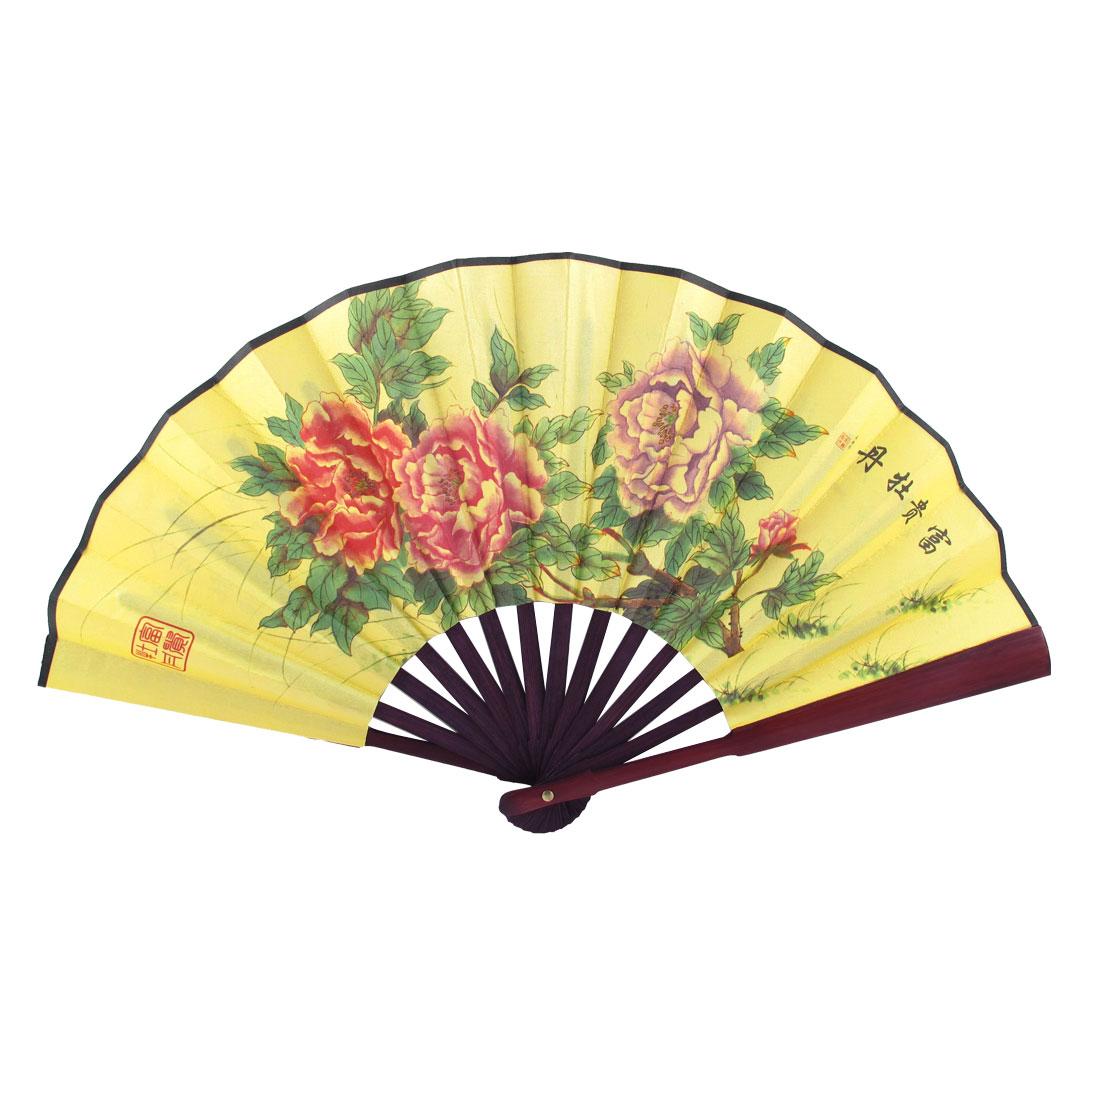 Bamboo Handle Peony Chinese Doggerel Print Folding Hand Fan 47cm Width Yellow